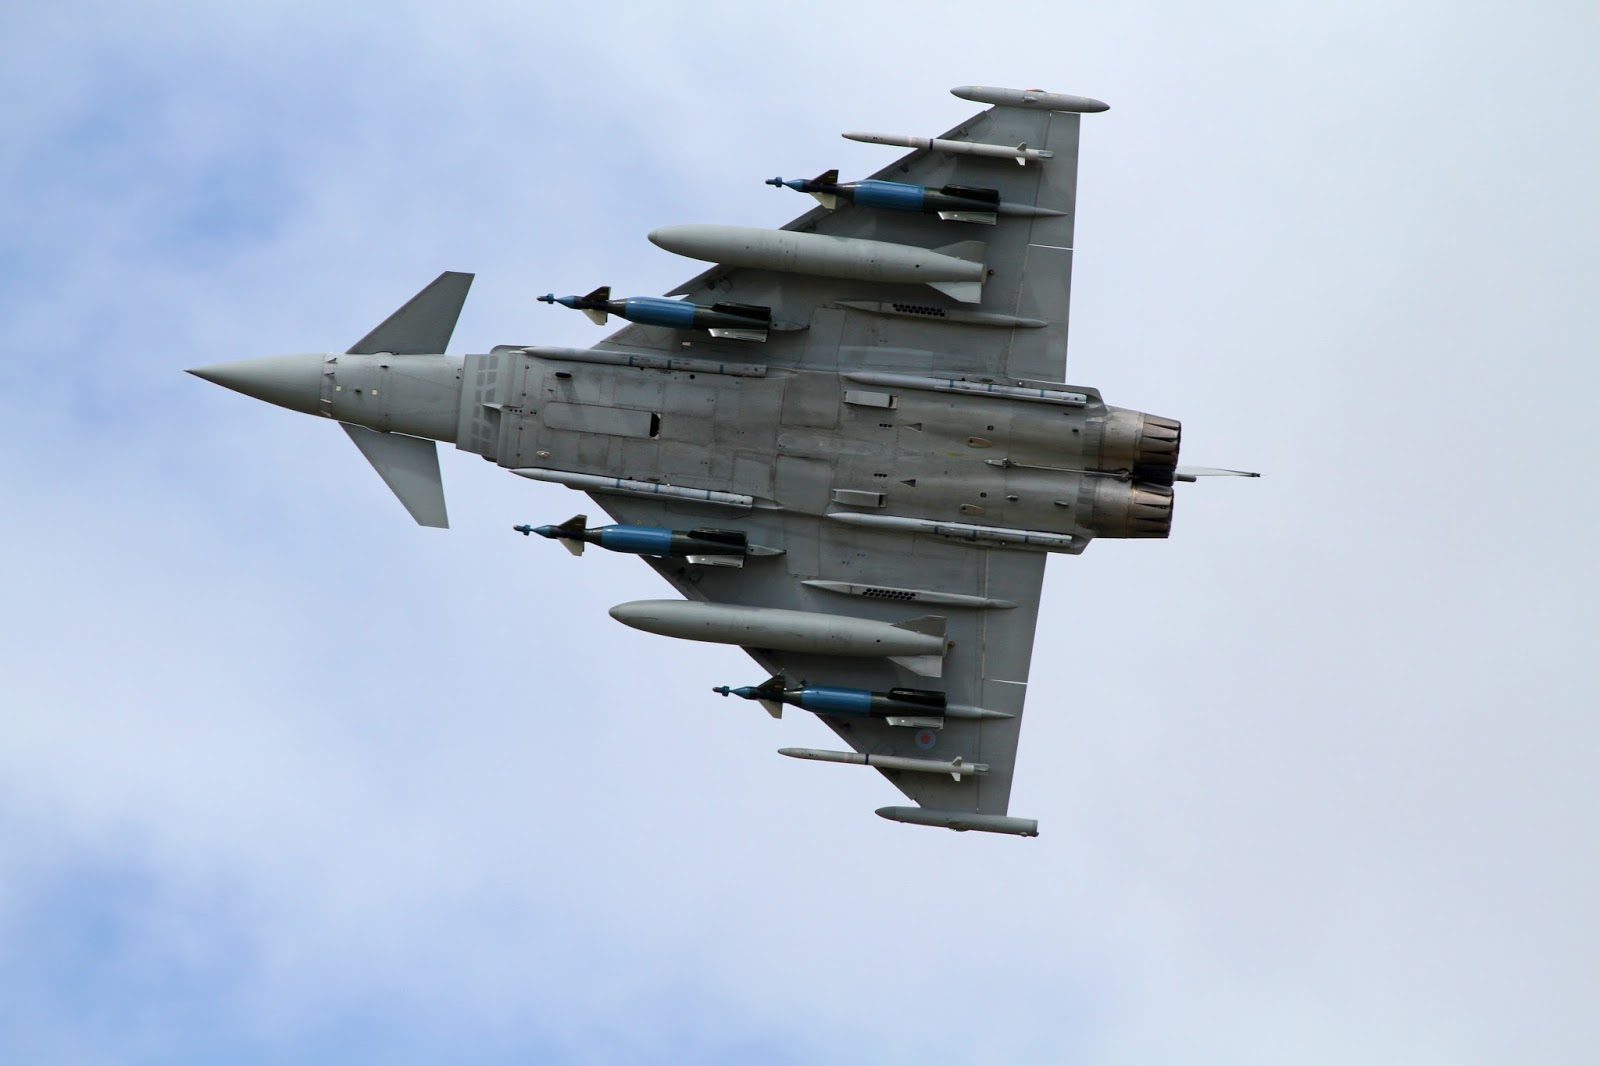 Defense Strategies: Eurofighter Typhoon F2 - A Photo Album